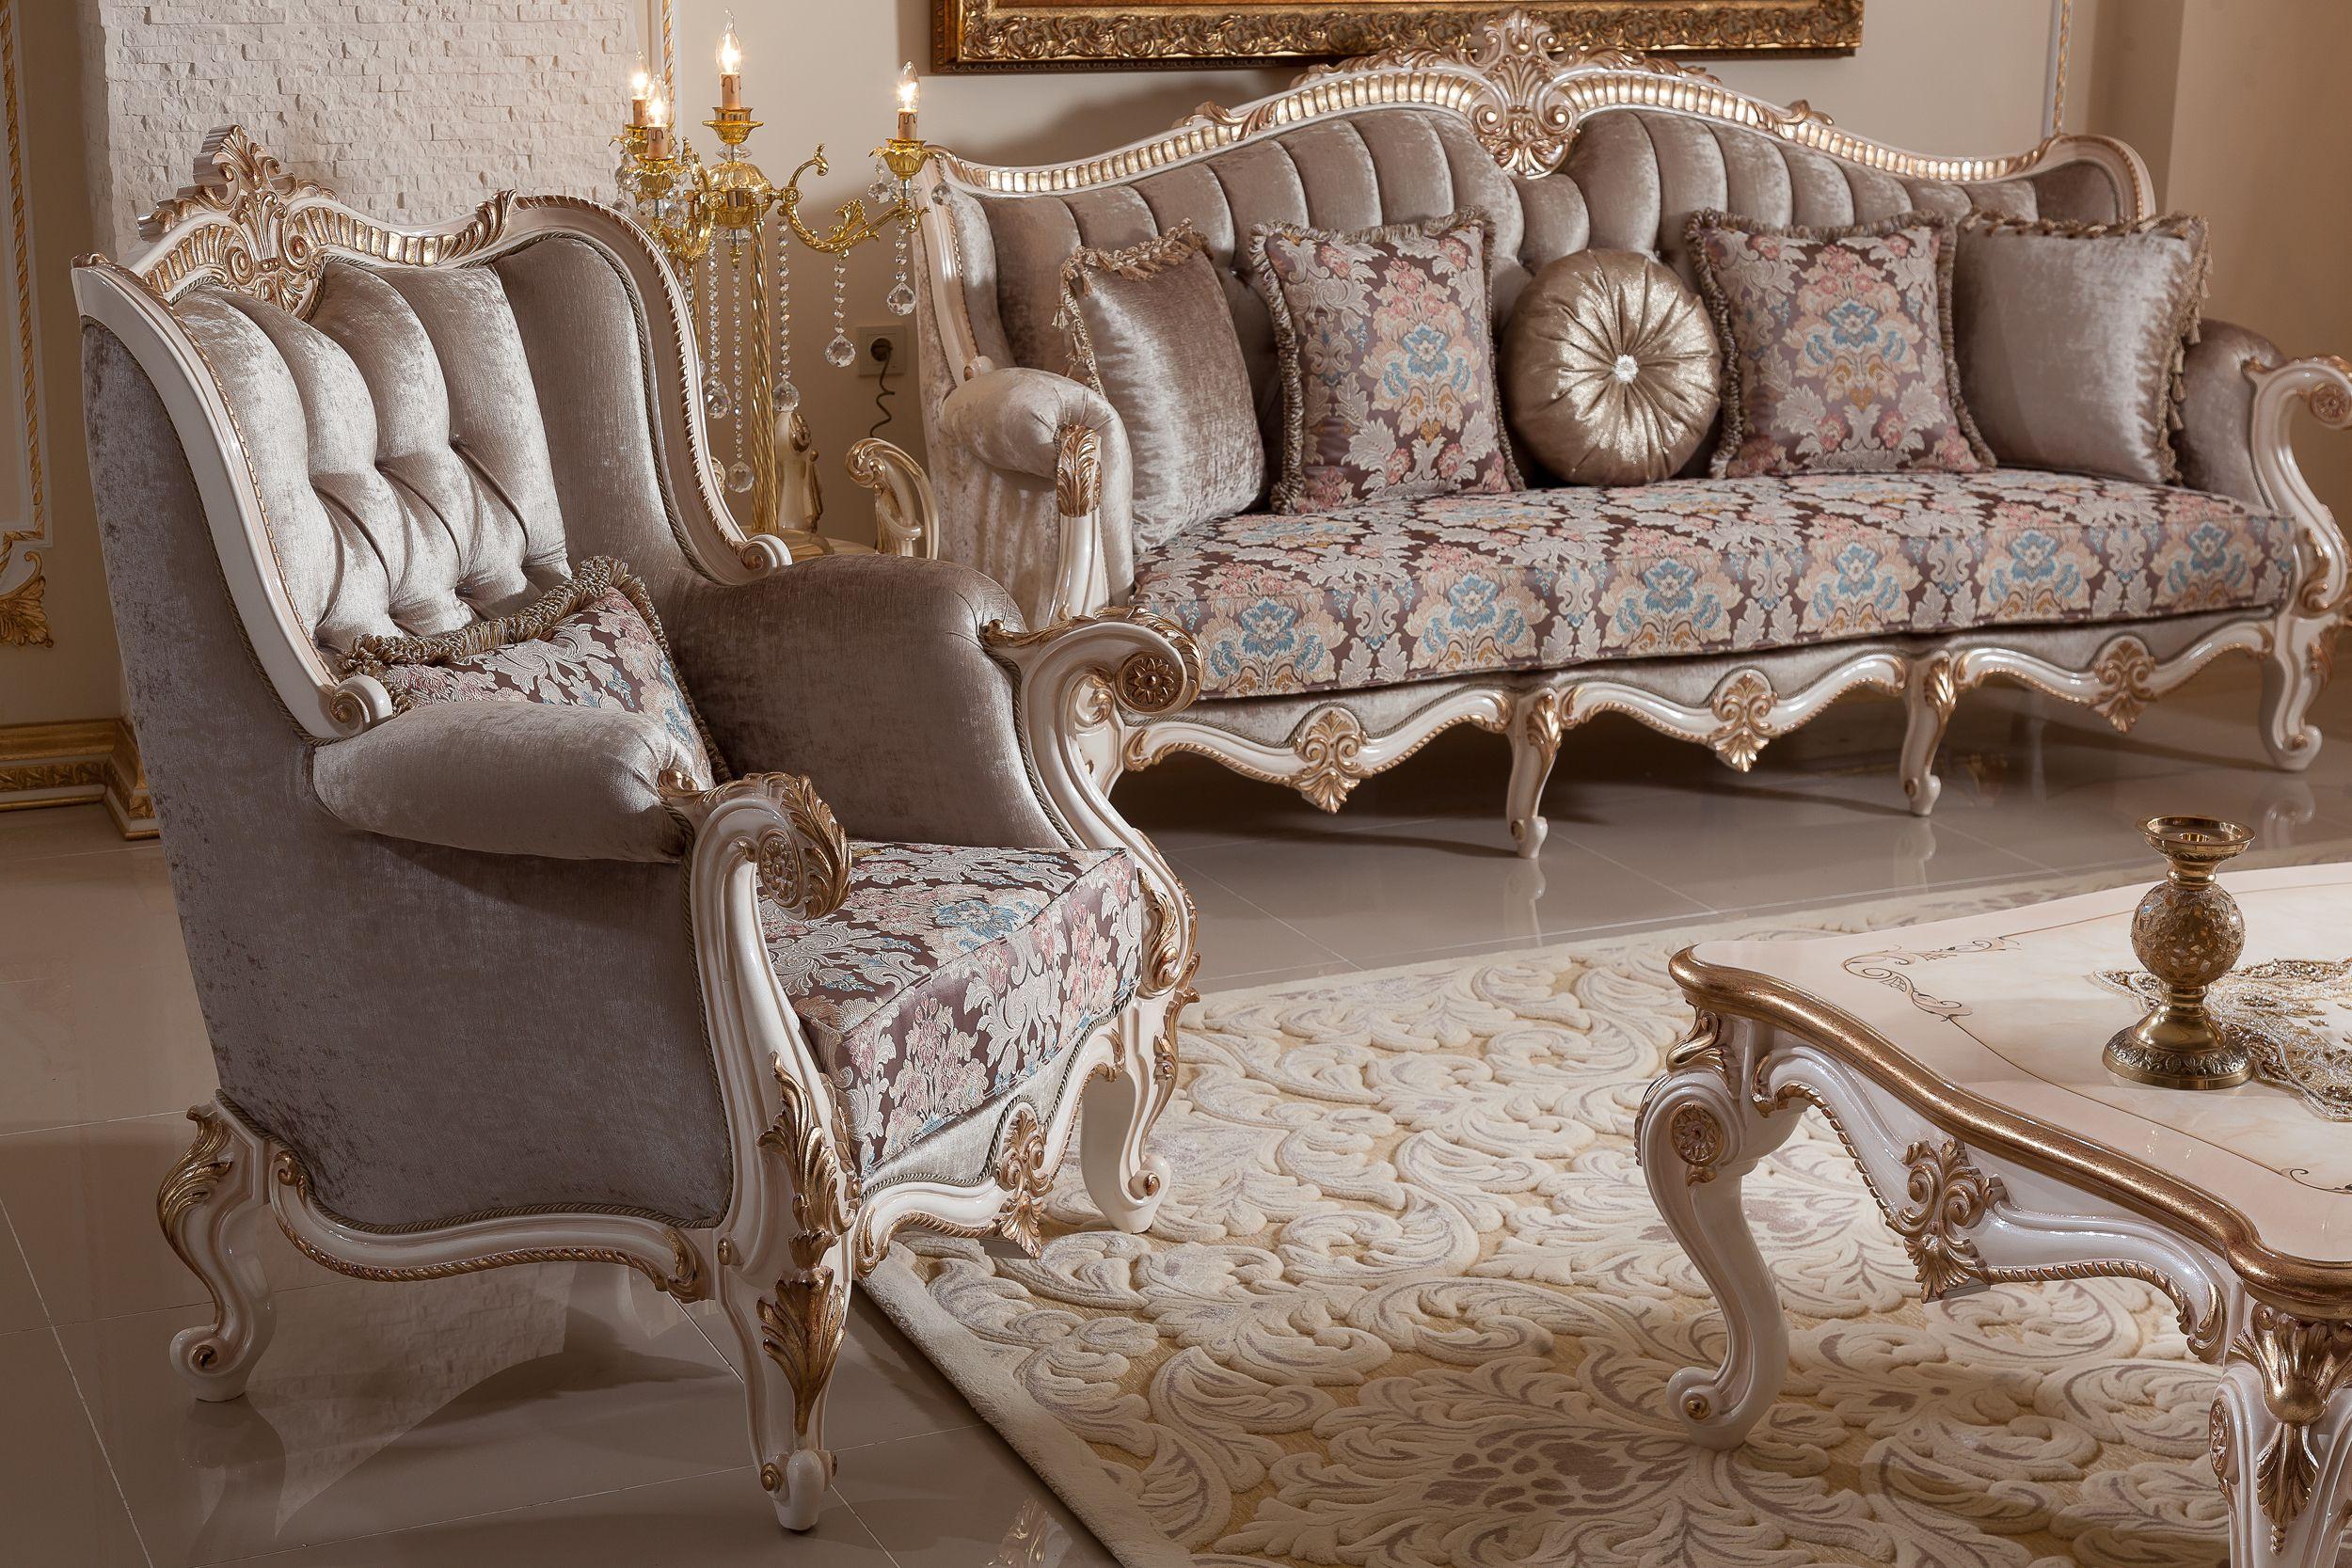 Inci Sofa Set Handmade Turkish Furniture You Can Give Order This